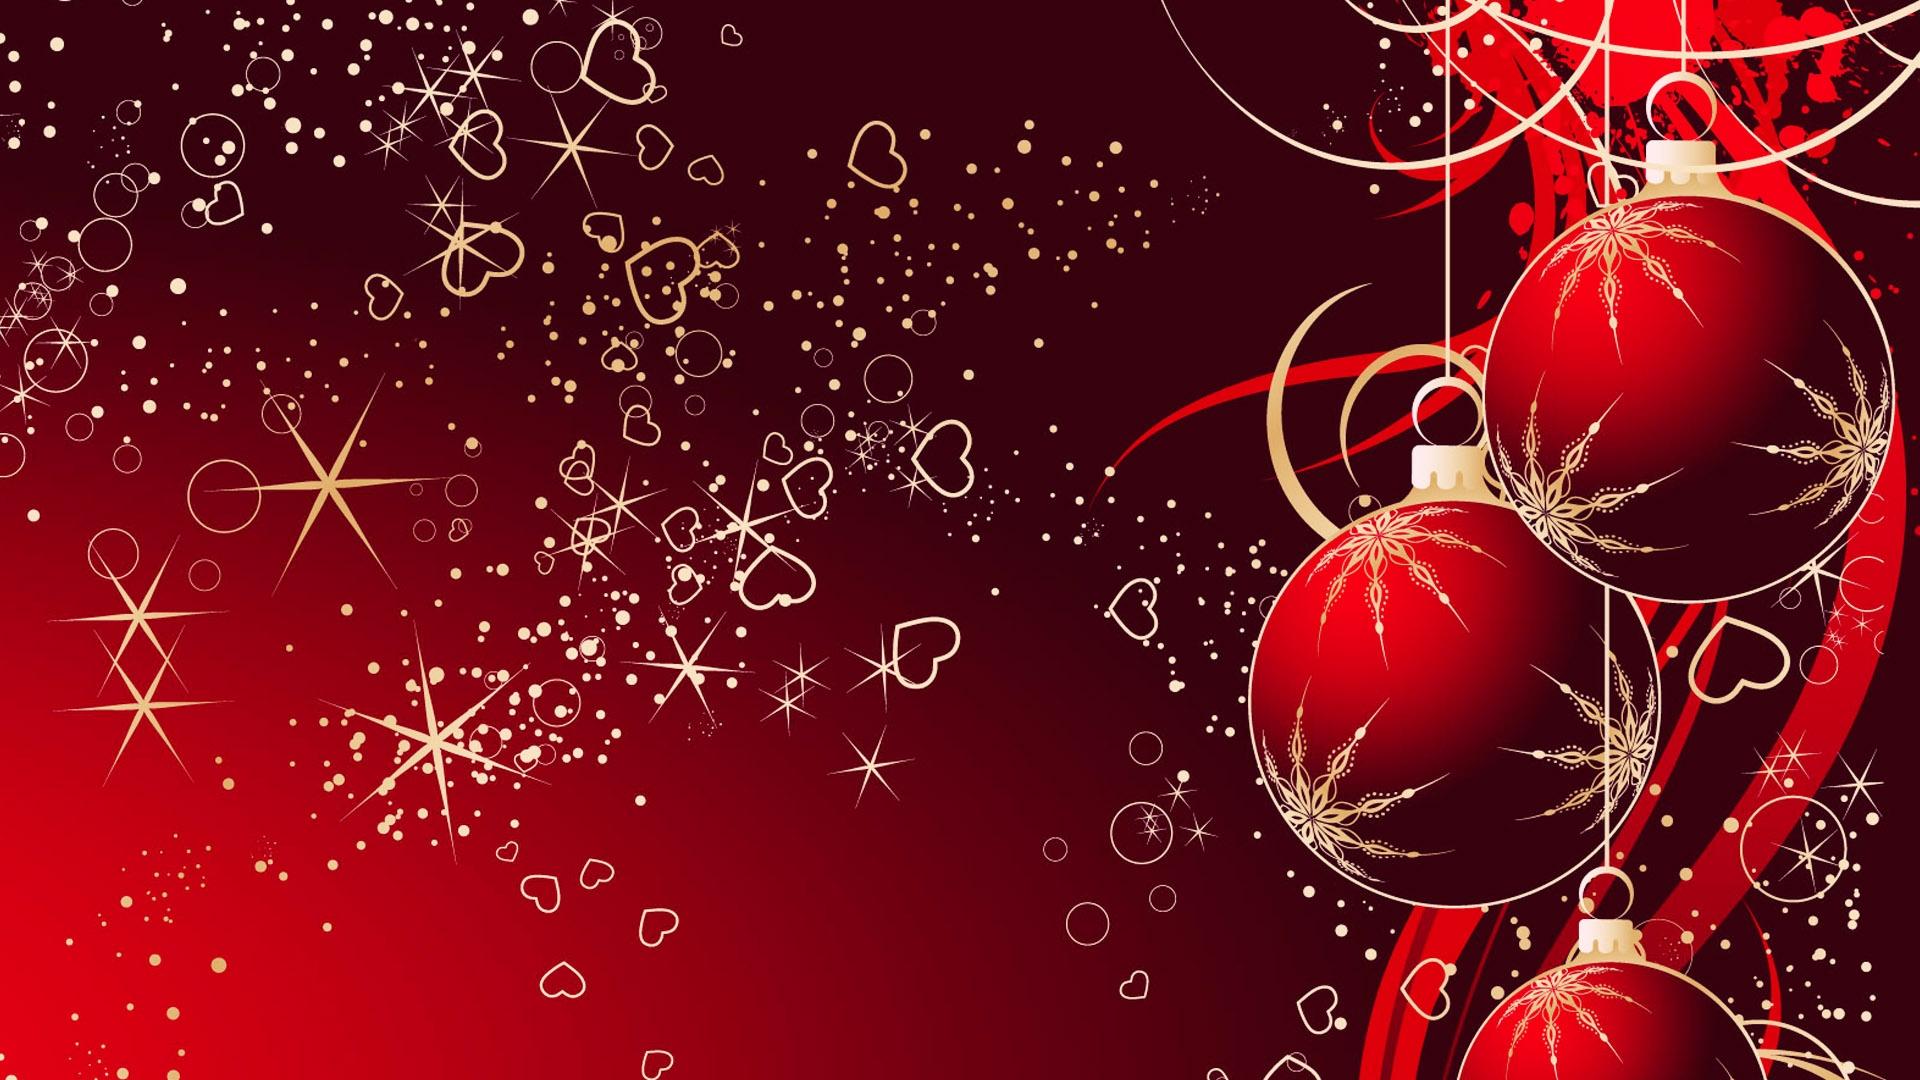 Free Download Beautiful Christmas Full Hd Wallpaper 7433